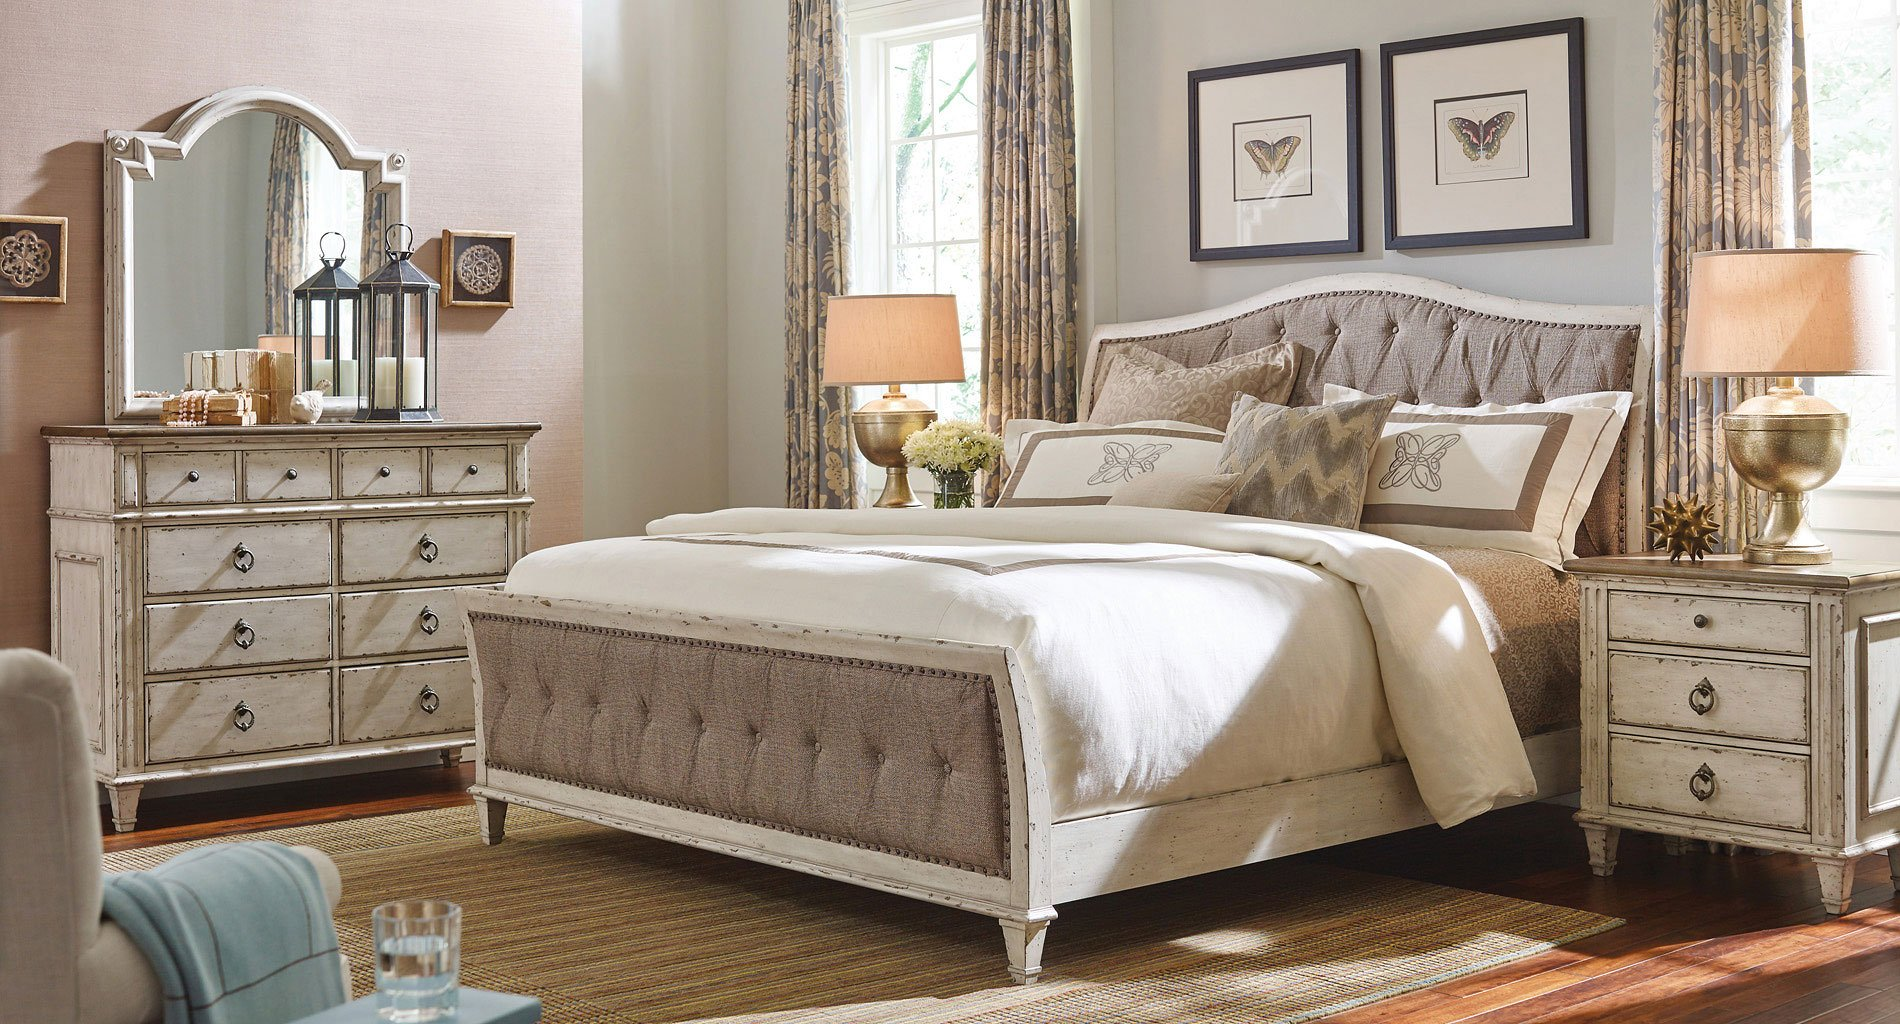 Southbury upholstered sleigh bedroom set american drew furniture cart for Upholstered sleigh bedroom set